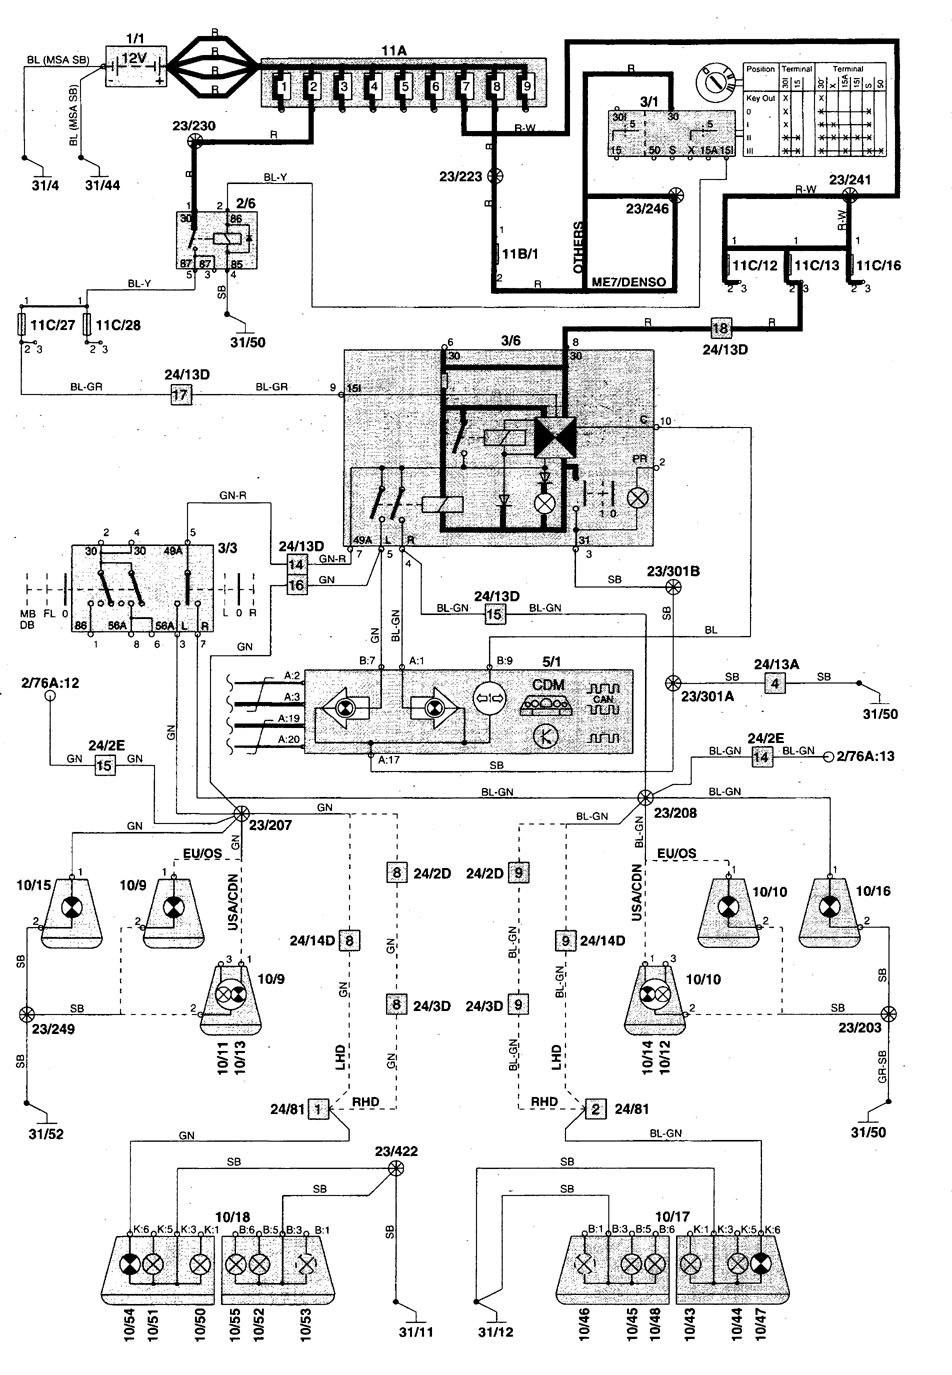 Volvo 850 Radio Wiring Diagram